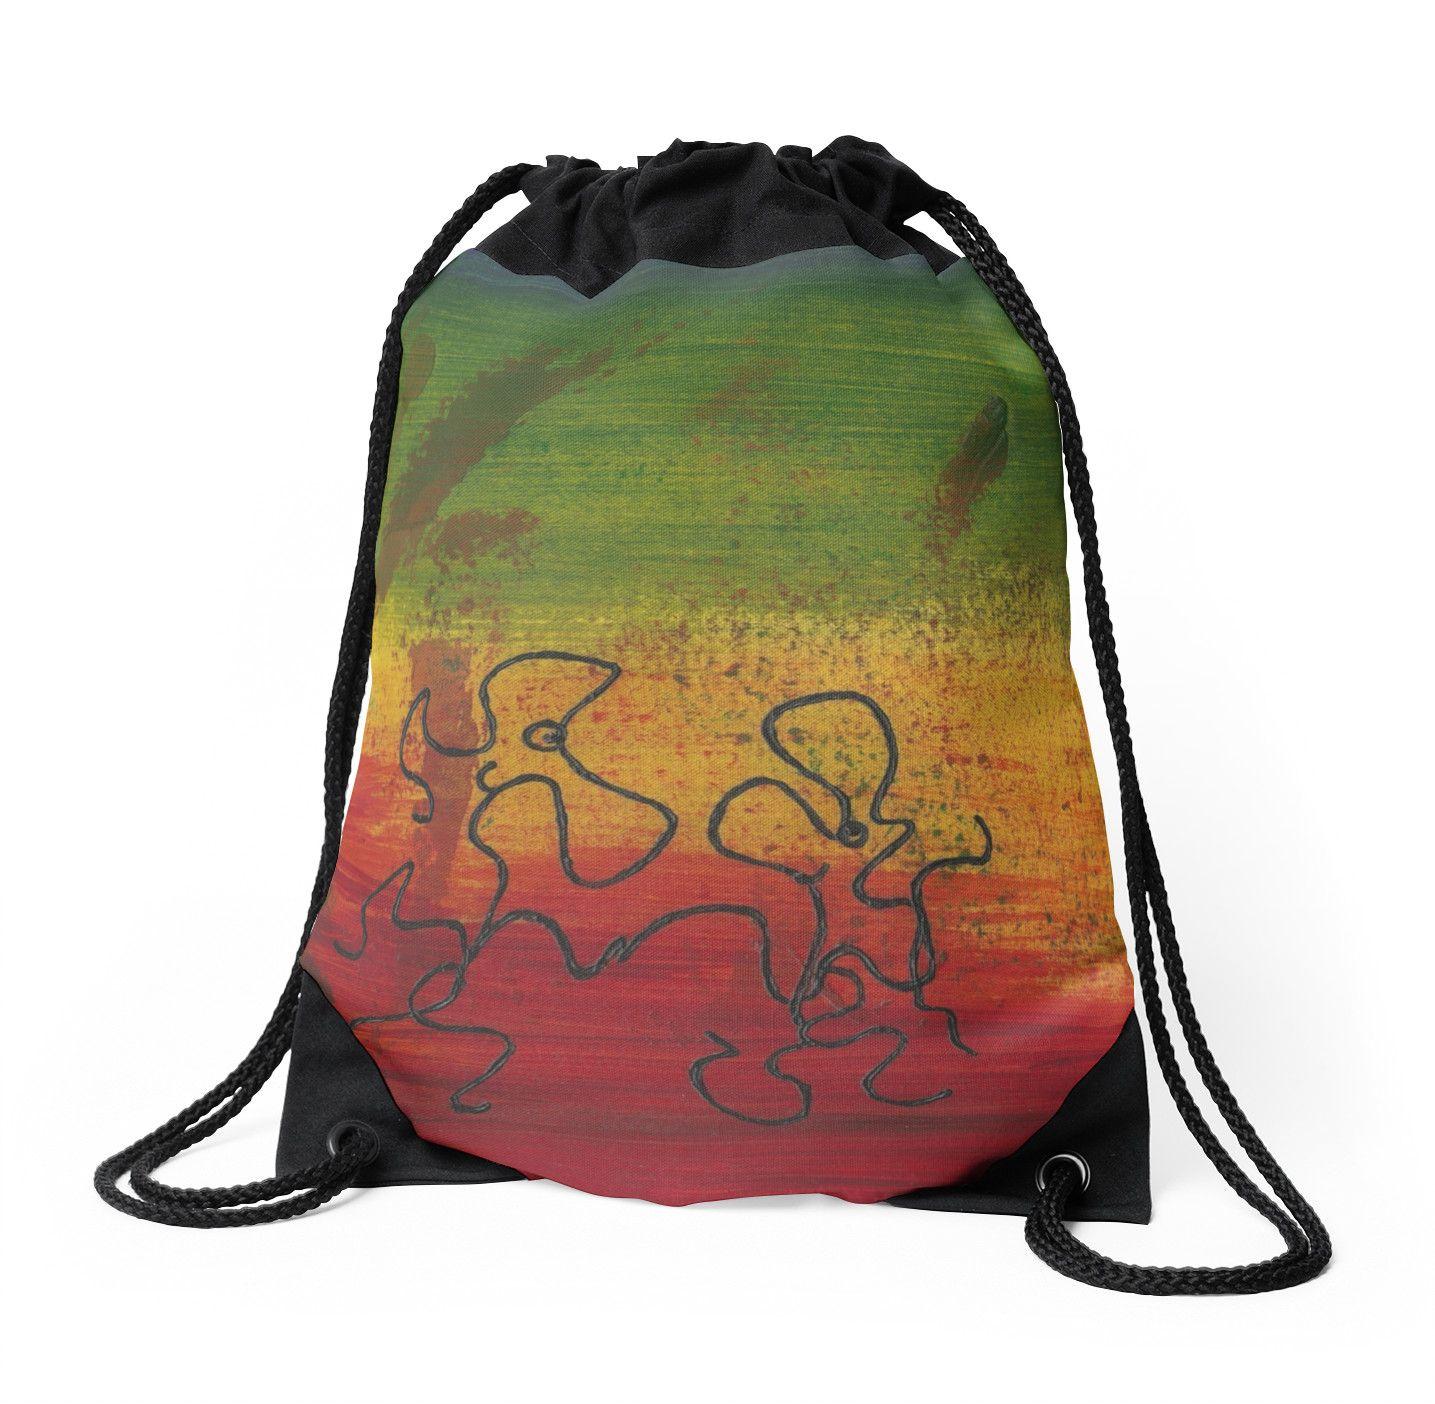 Dance Art Dancing Couple 28B  Drawstring Bag by Manuel Süess  81821e57b